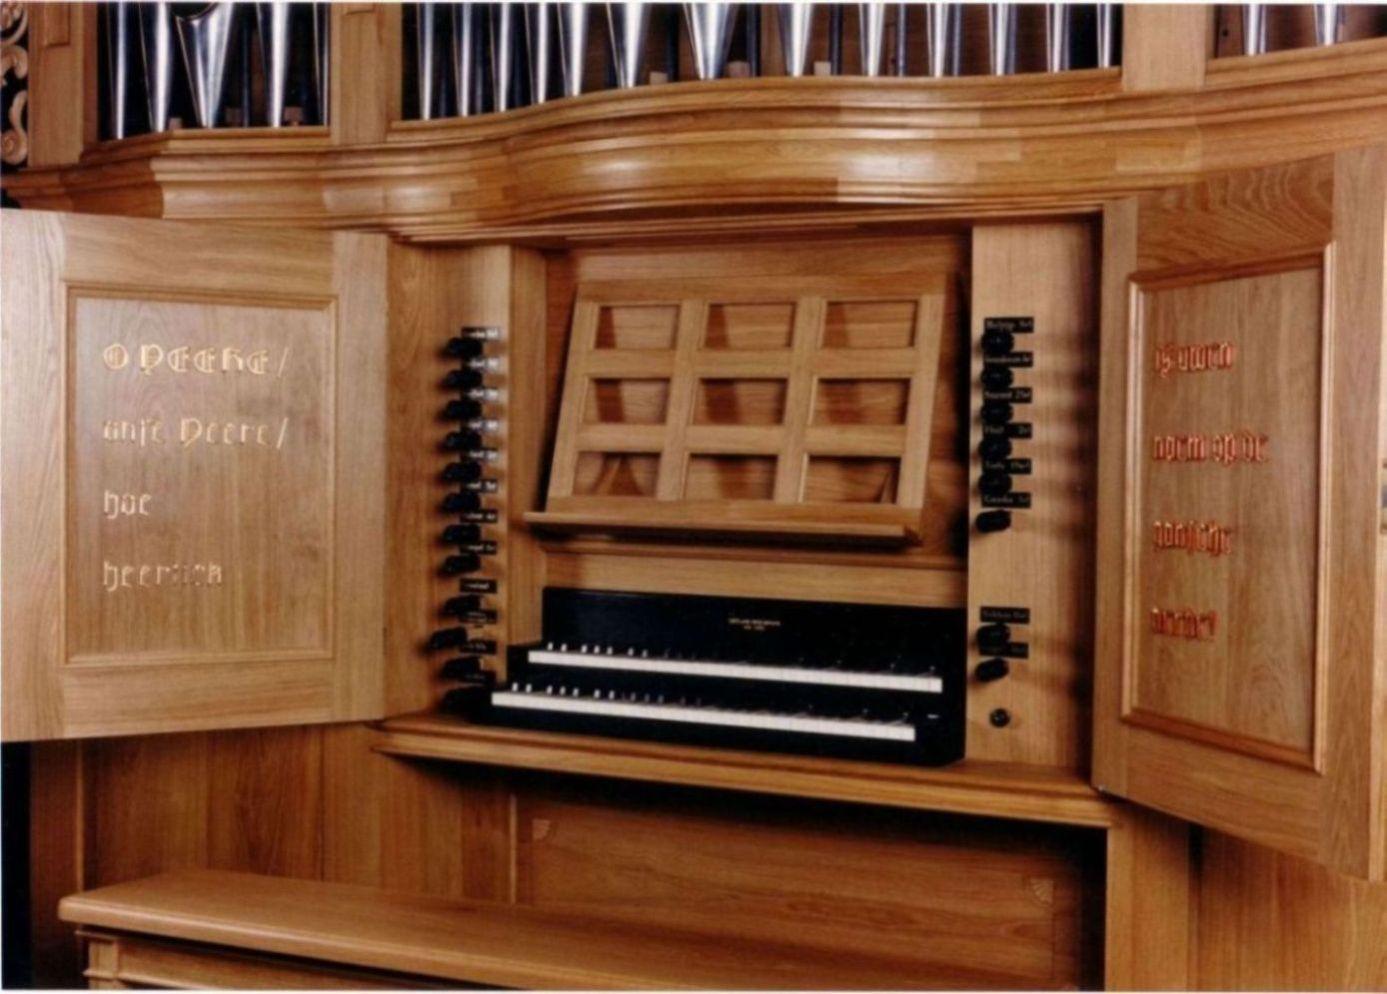 Orgel Leeflang 1991 Kandelaarkerk - Excursie Hetty Koelewijn 2016